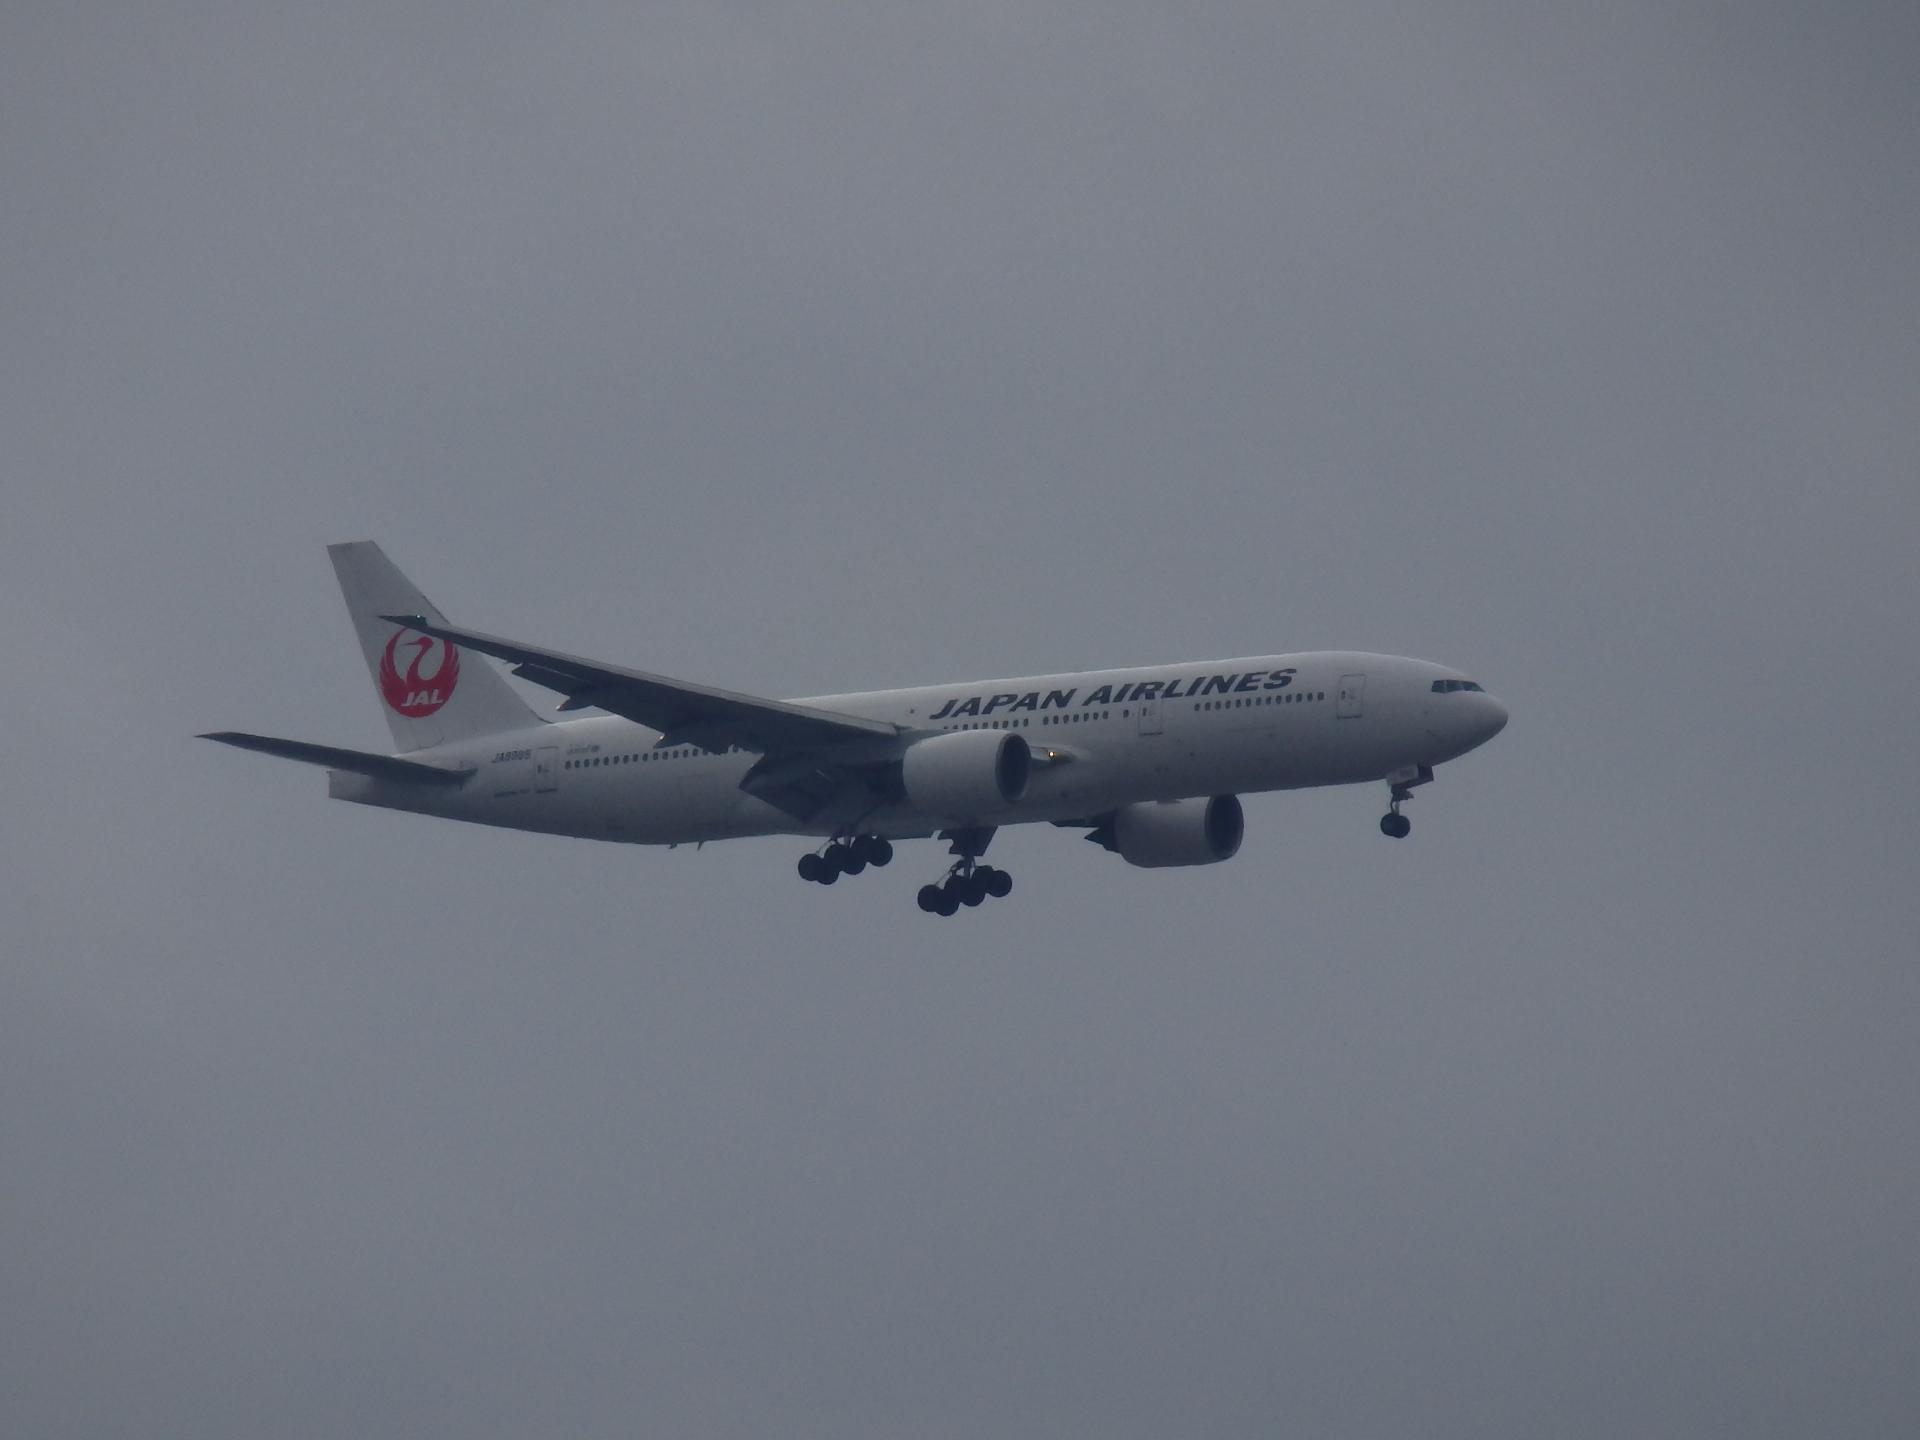 JA8985・元スタージェット「プロキオン号」です。